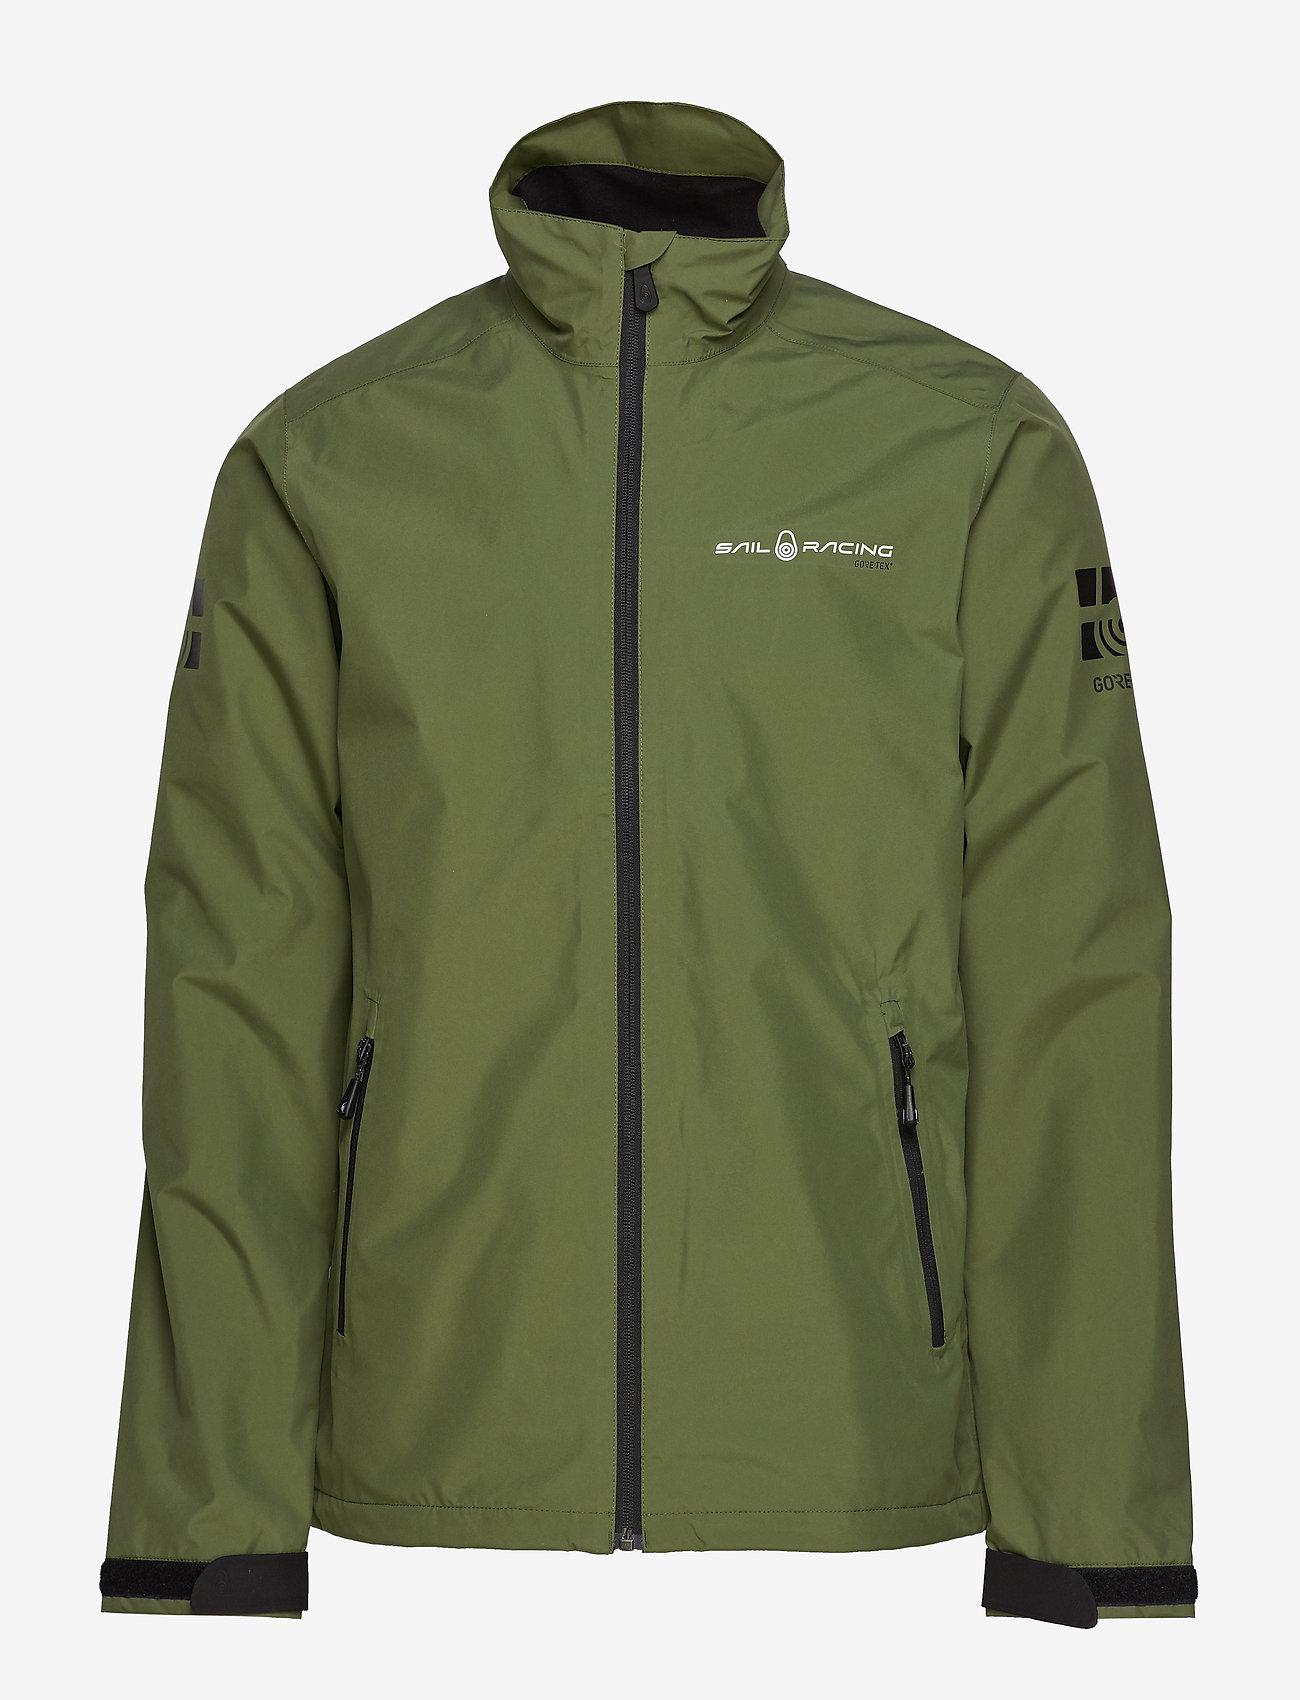 Sail Racing - GORE TEX LINK JACKET - sports jackets - modern green